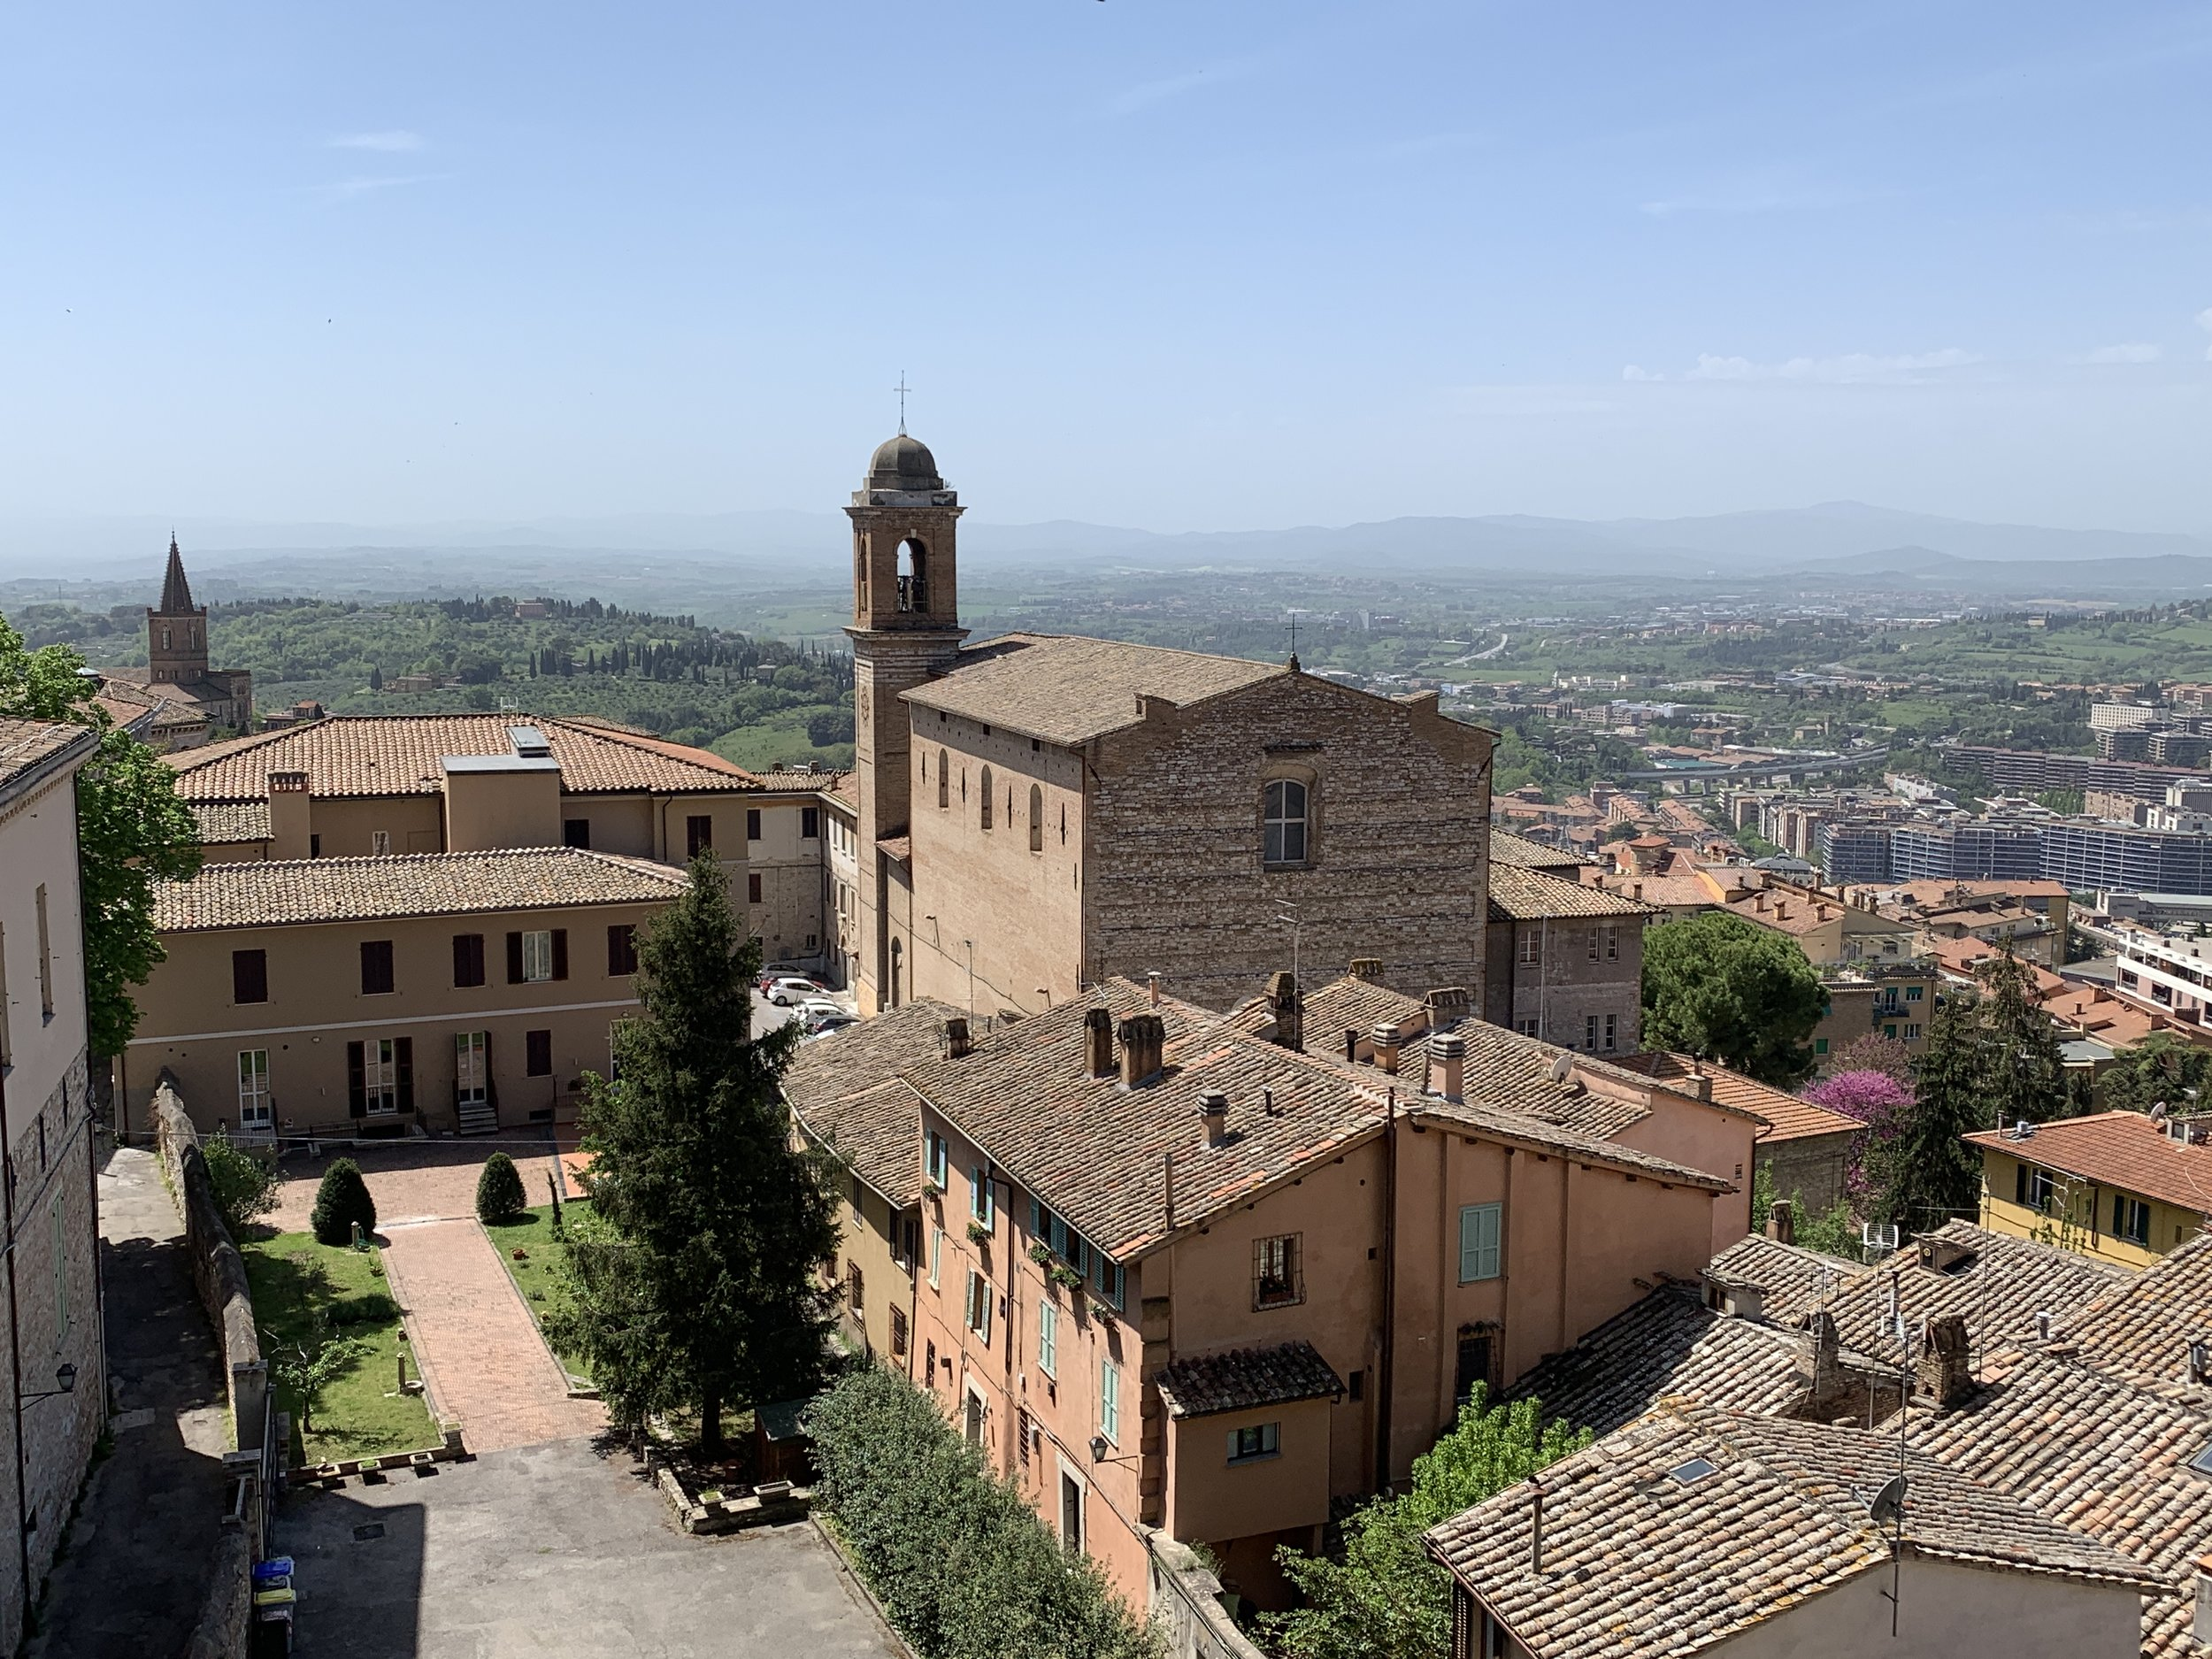 Beautiful Perugia, Italy